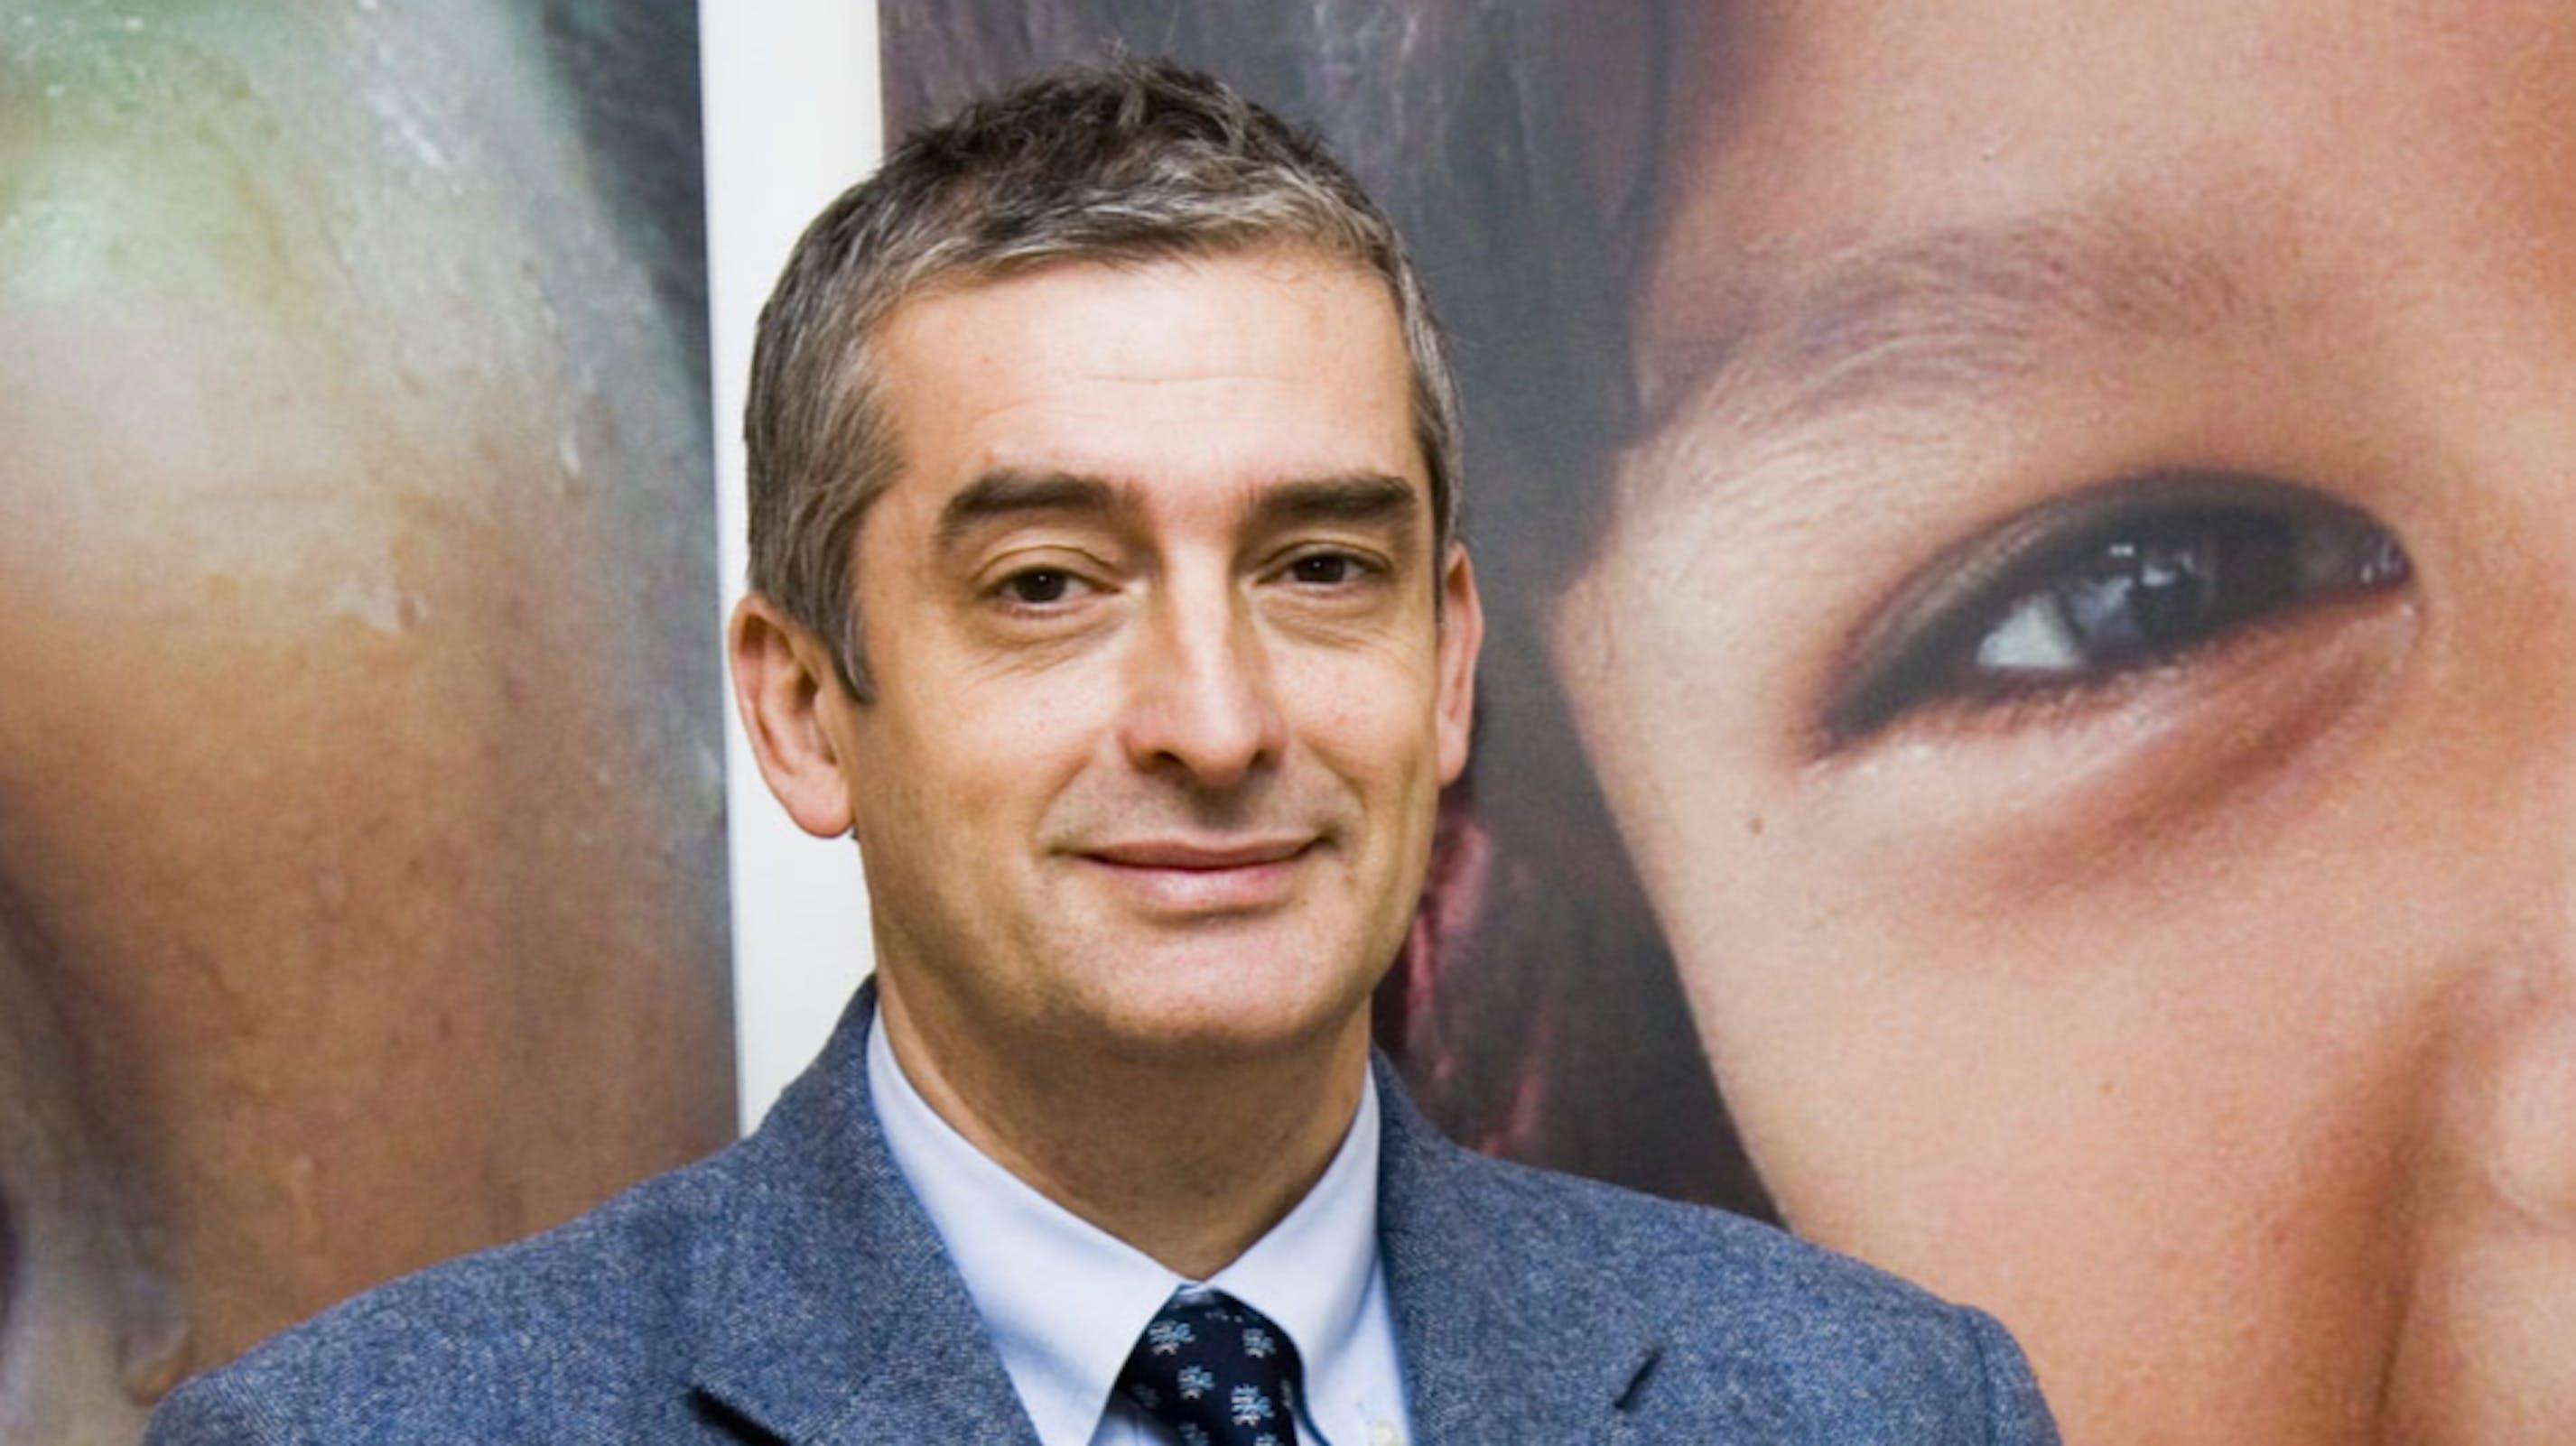 Paolo Rozera, direttore generale UNICEF Italia - ©UNICEF Italia/2015/Alessandro Longobardi